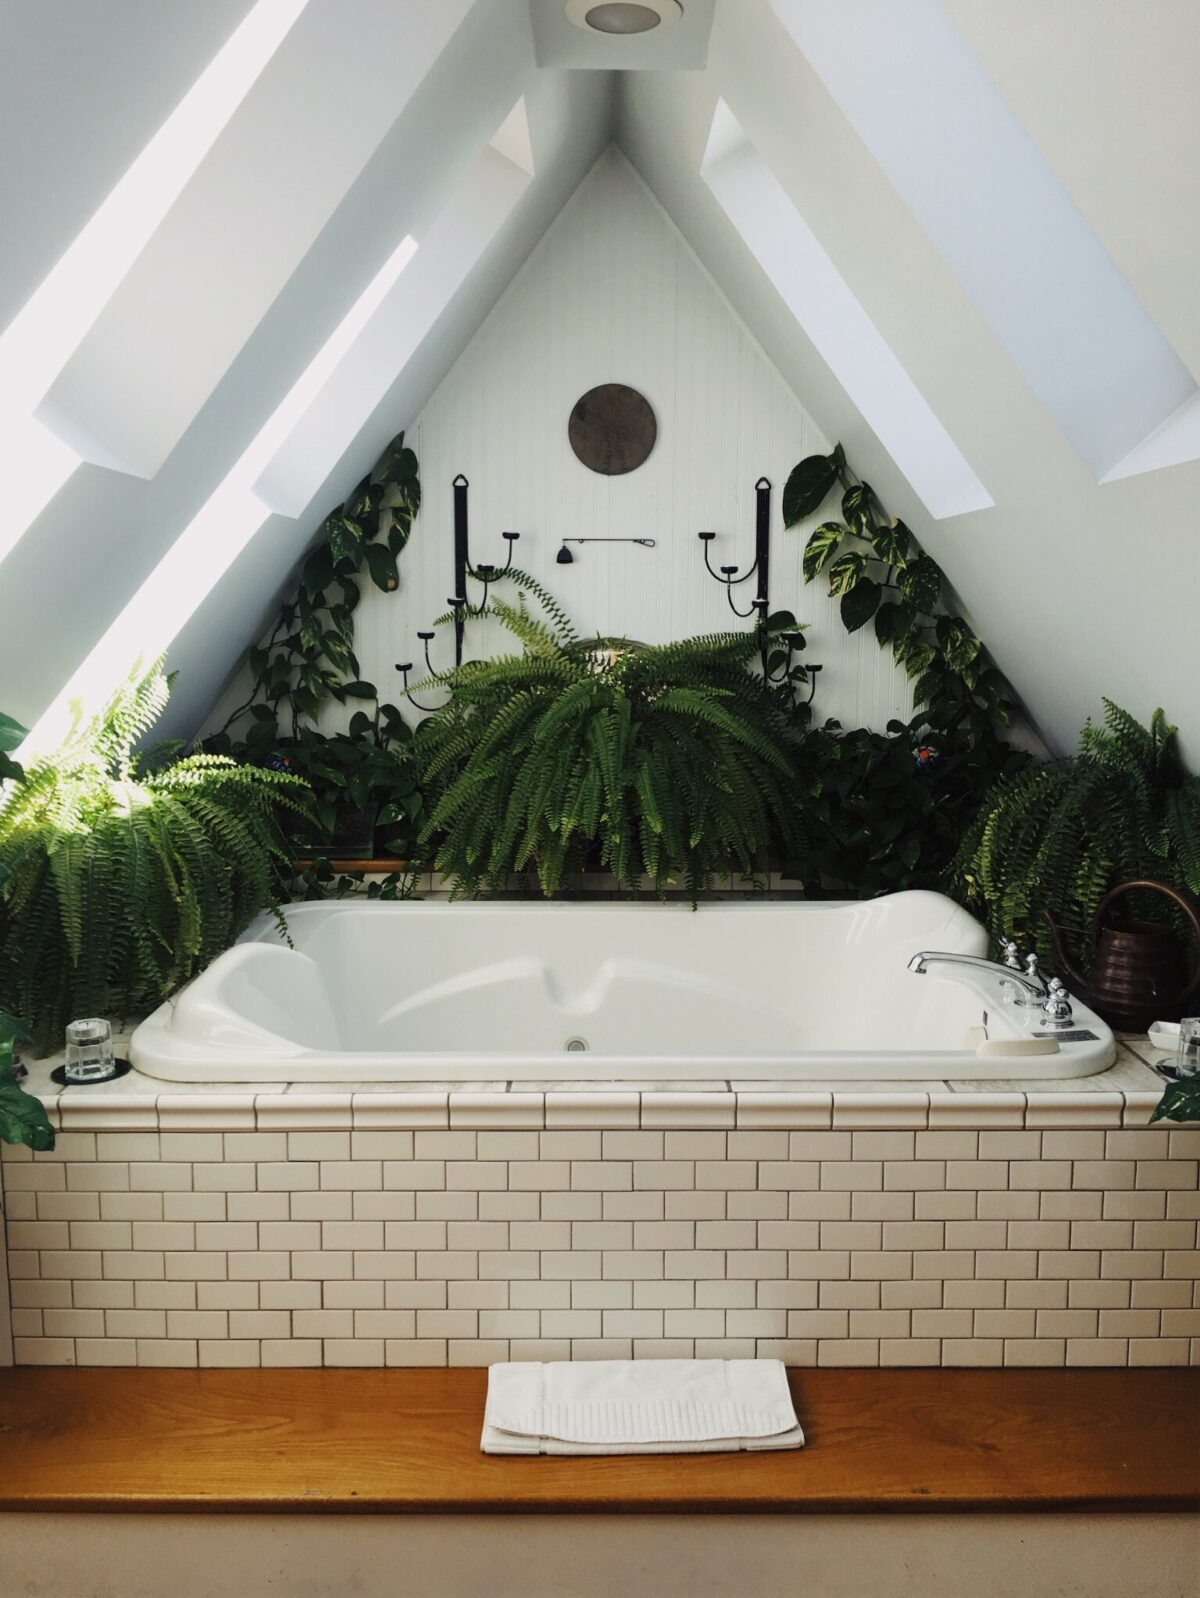 destress bathtub with plants